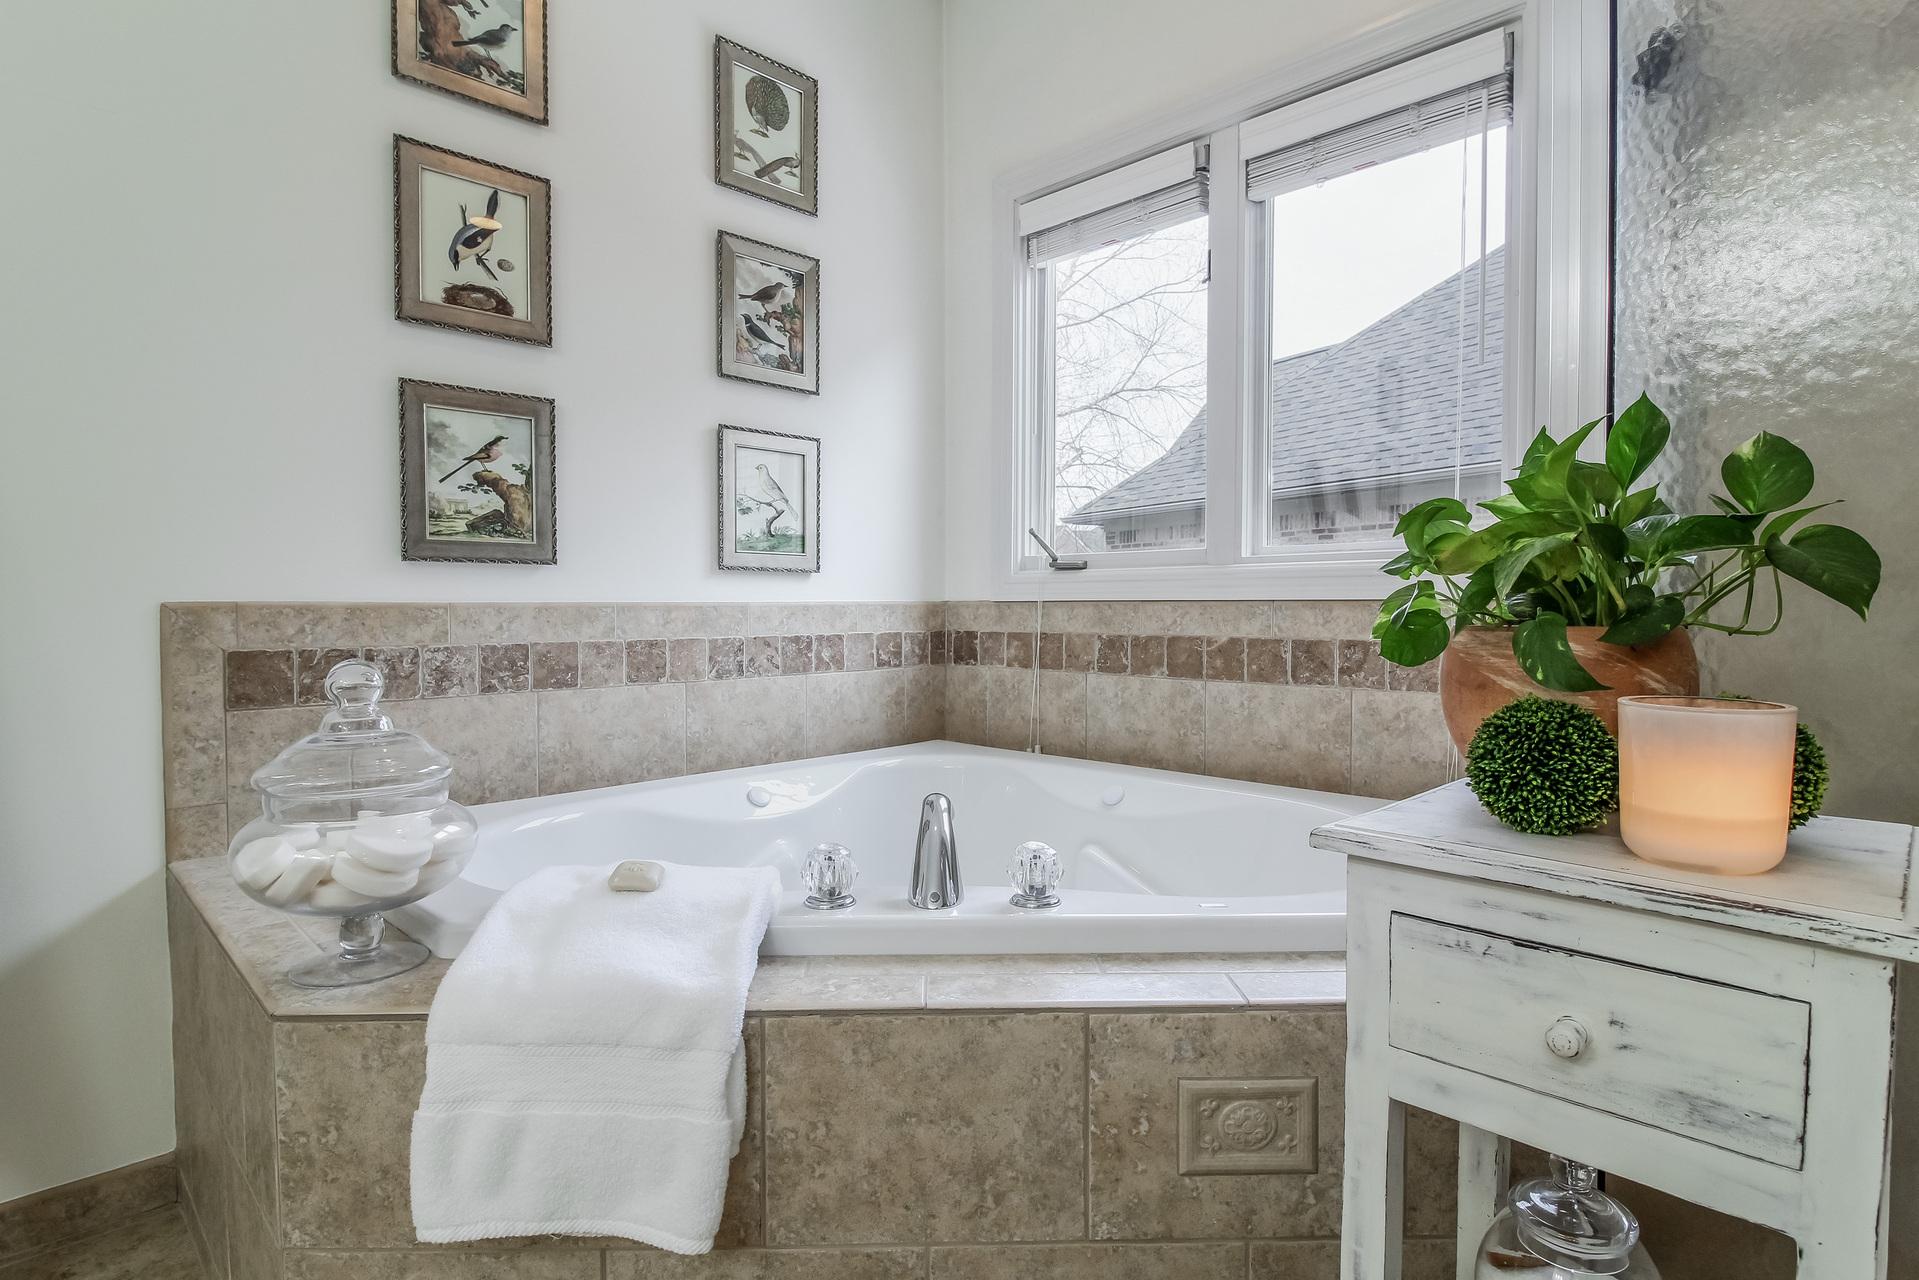 025-Bathroom-5442213-medium.jpg